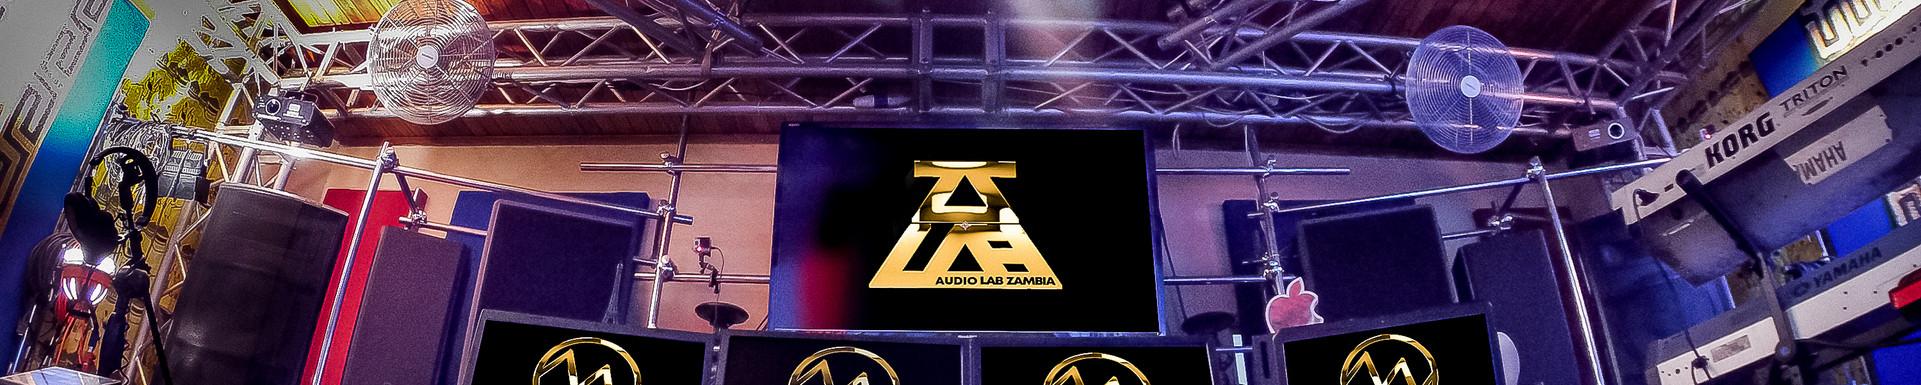 AUDIOLABZAMBIA_STUDIO-4.jpg